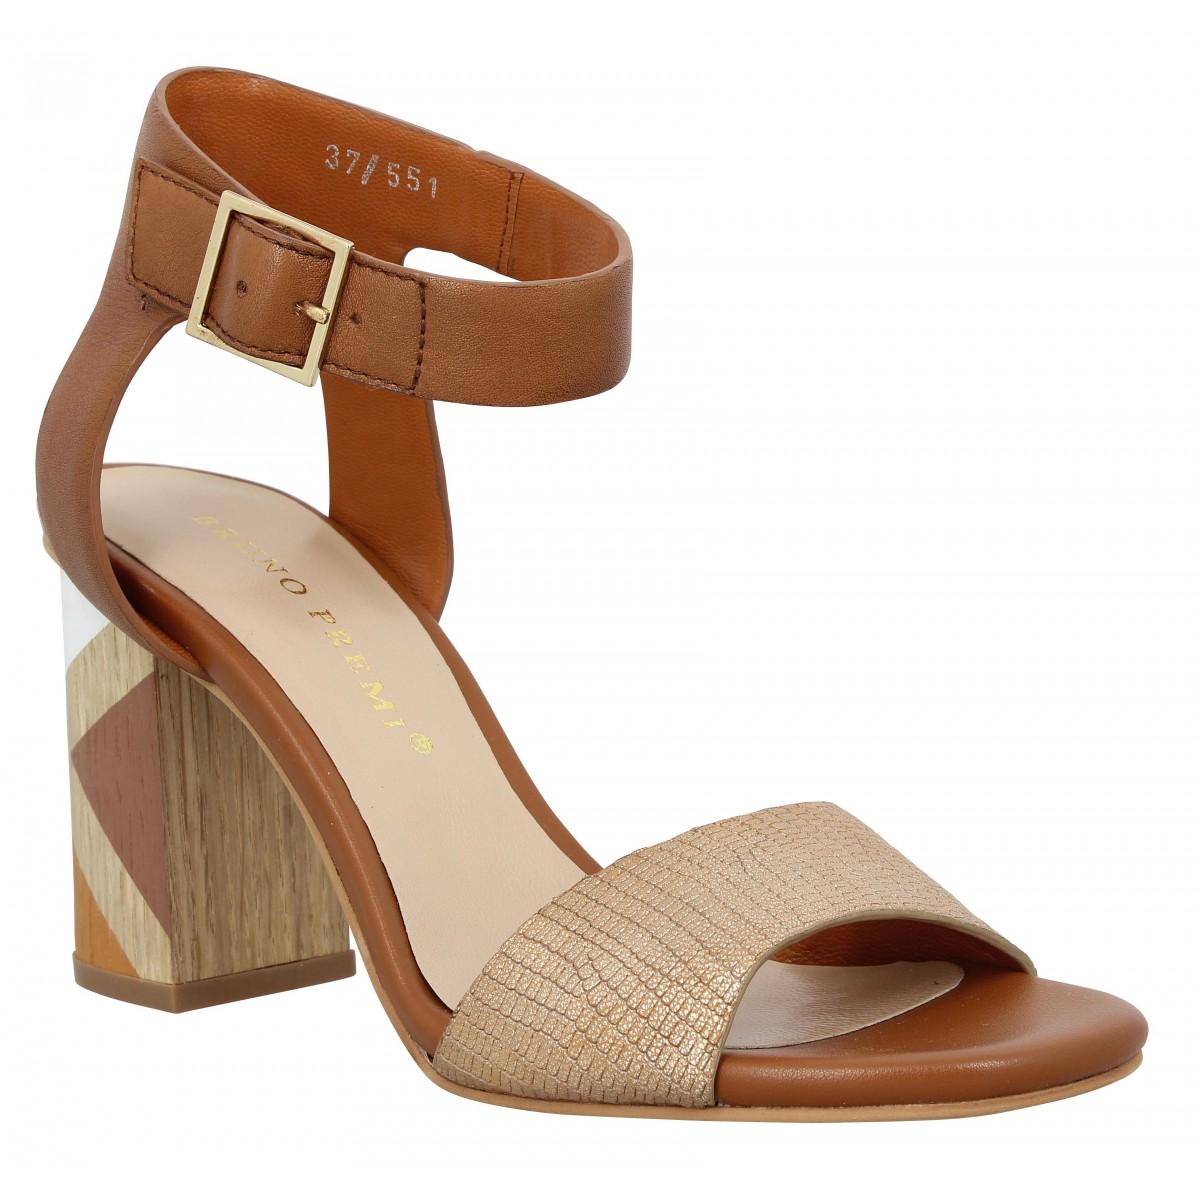 Sandales talons BRUNO PREMI K1403 cuir Femme Cognac